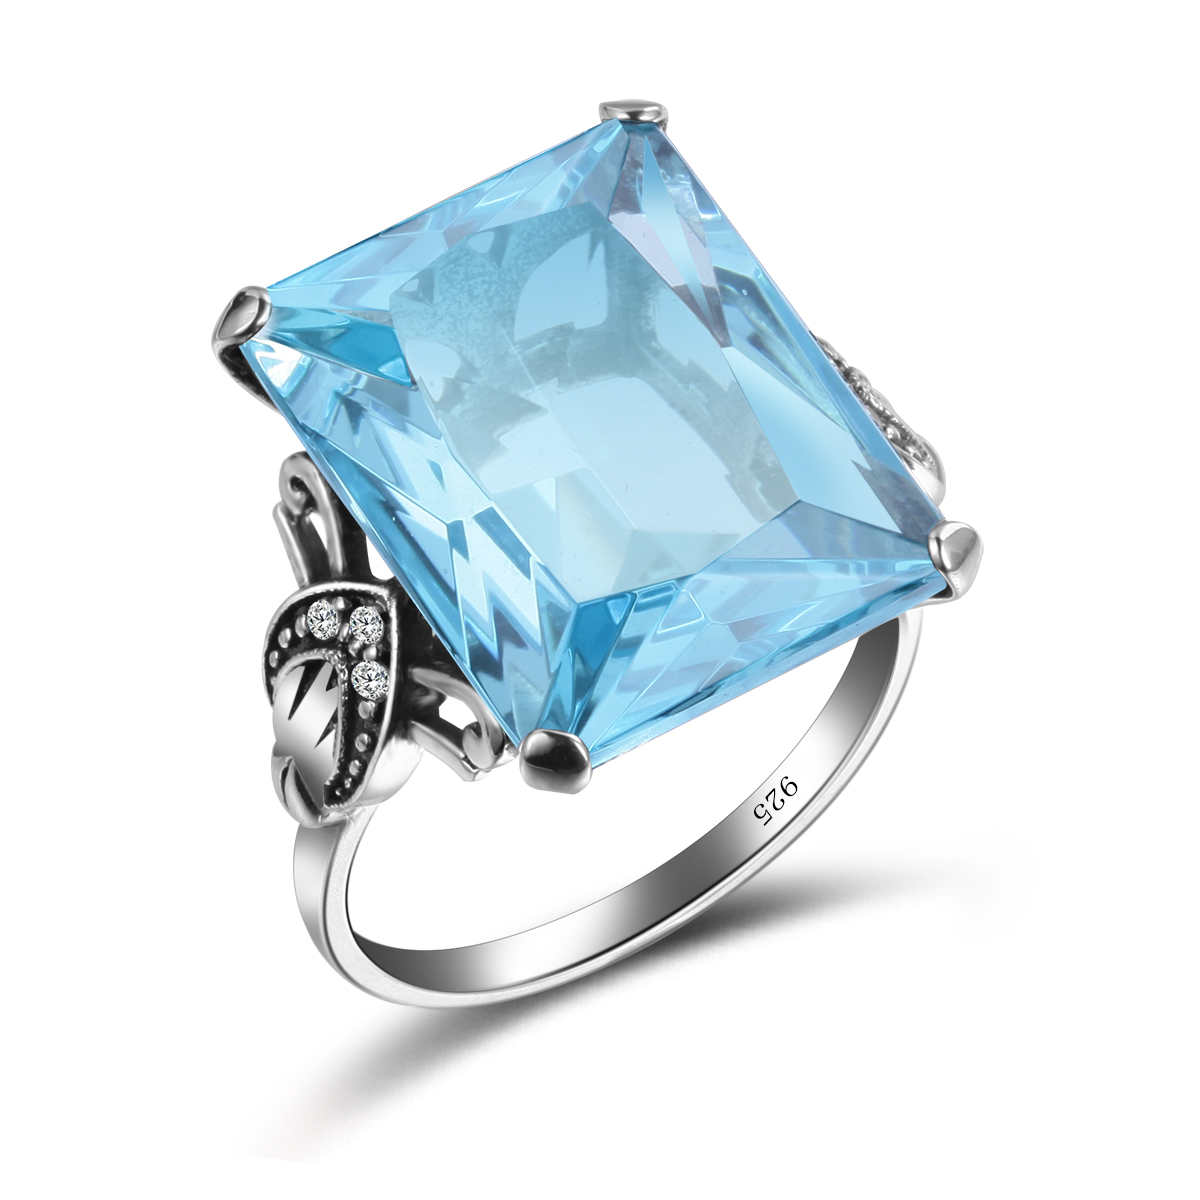 100-authentic-925-fontbsterling-b-font-fontbsilver-b-font-dazzling-aquamarine-finger-rings-for-women